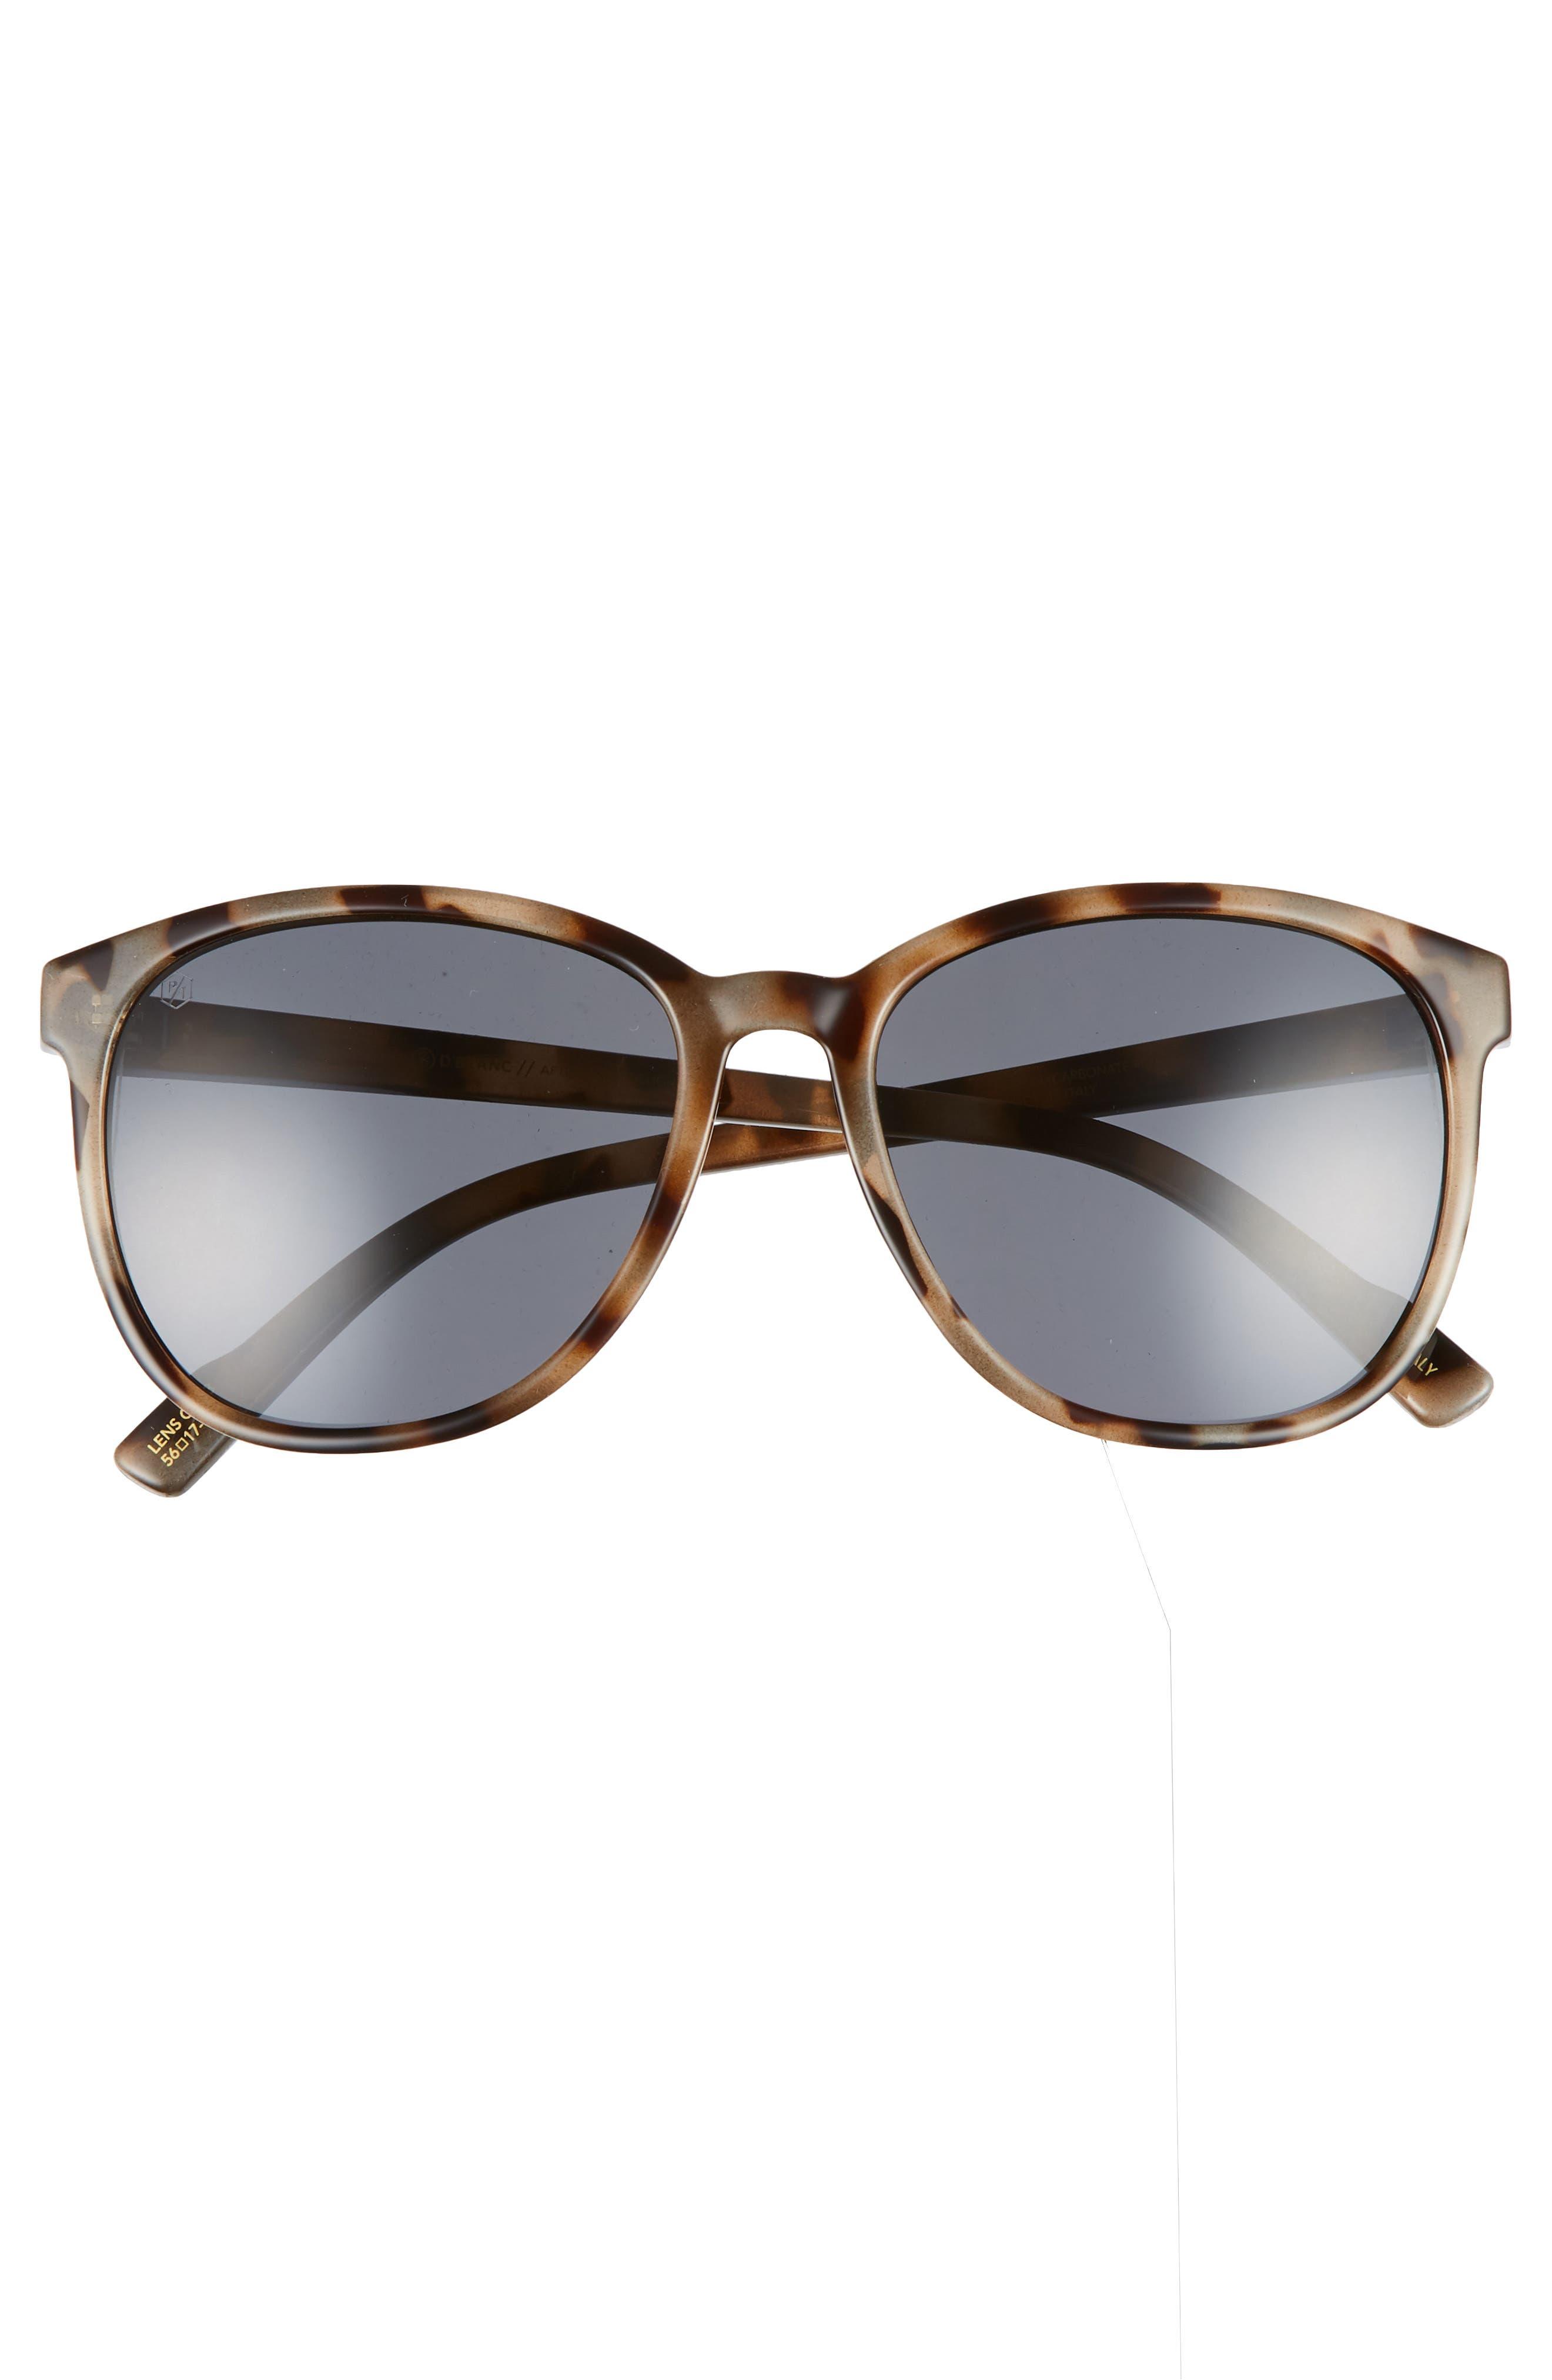 D'BLANC Afternoon Delight 56mm Polarized Sunglasses,                             Alternate thumbnail 3, color,                             SNOW LEOPARD/ GREY POLAR